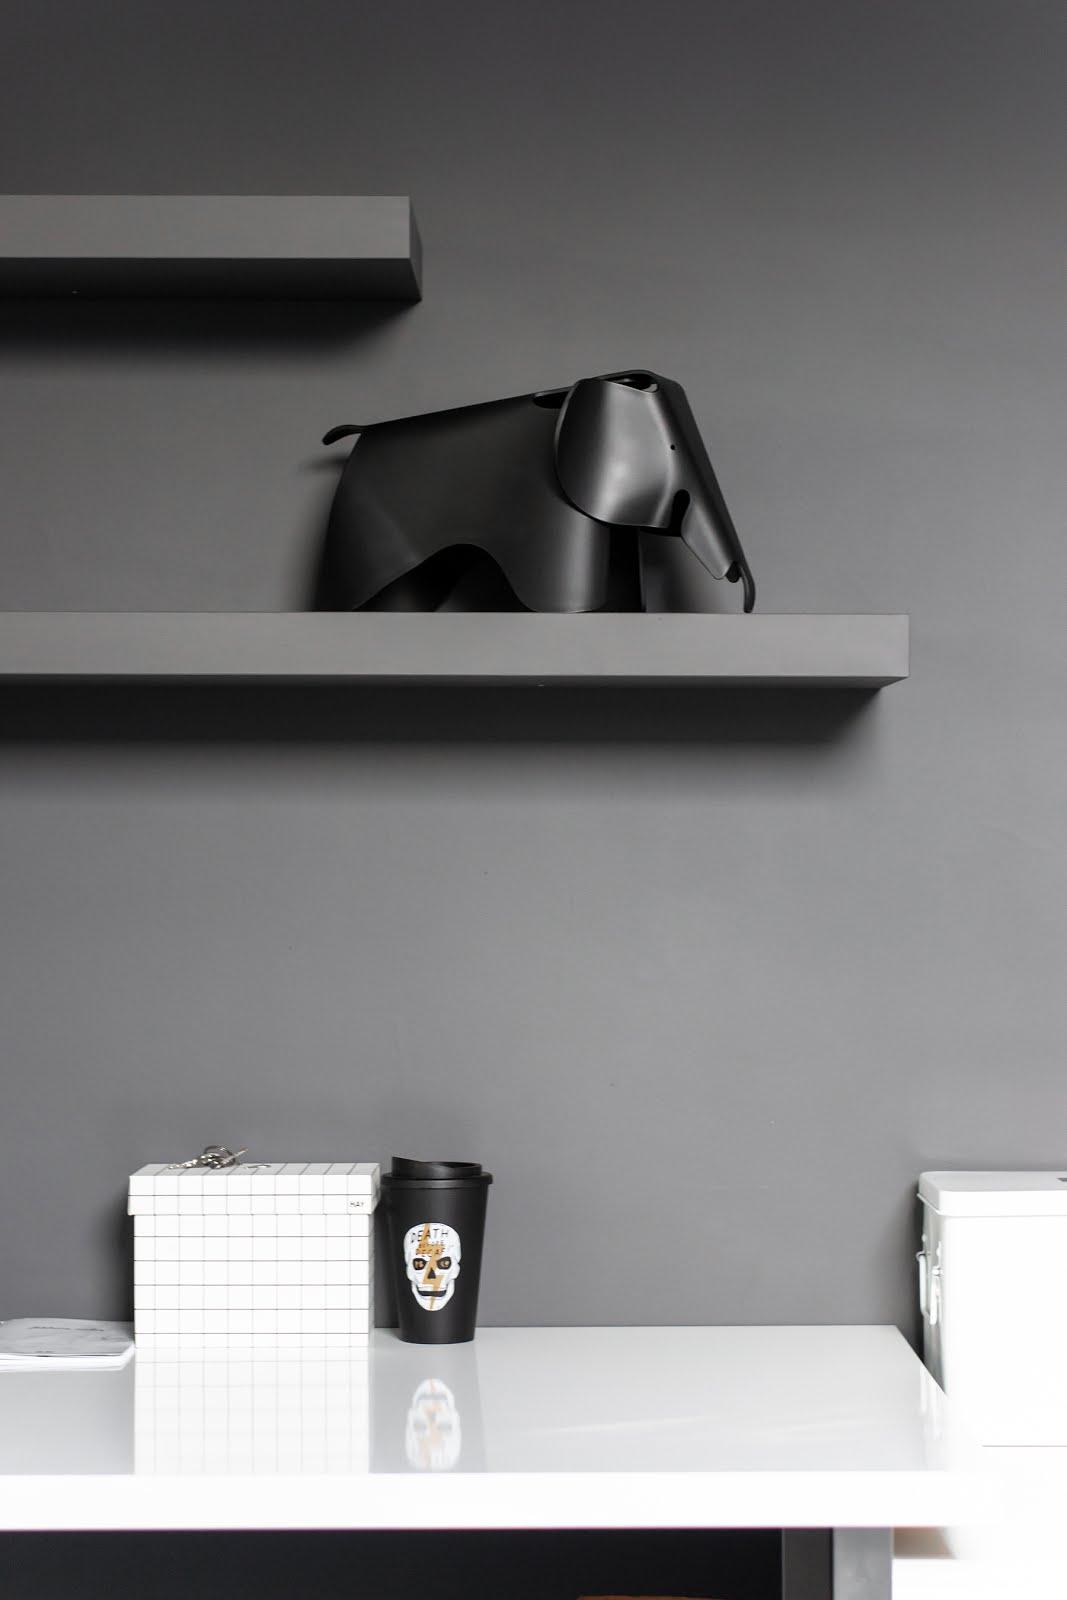 Vitra, charles & ray eames, elephant, small, black, interior, mister design